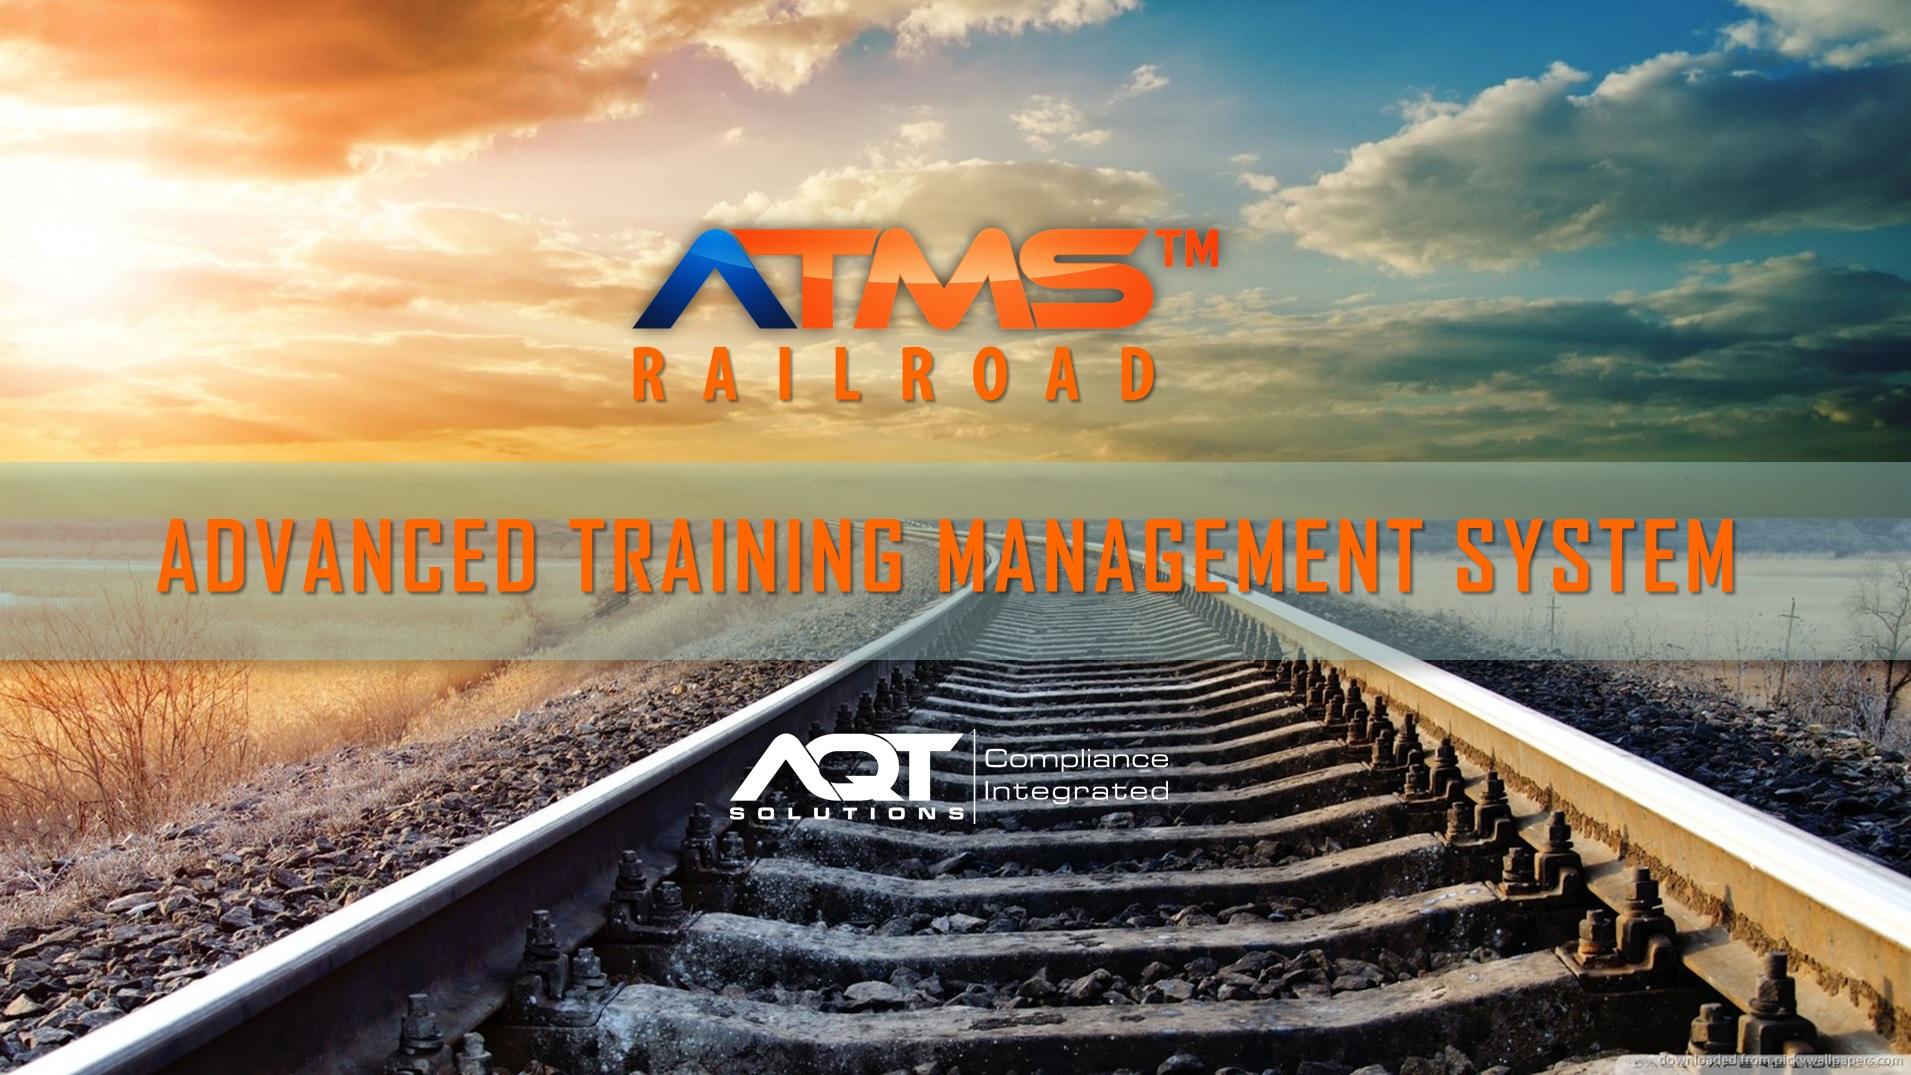 Railroad-Slide-1